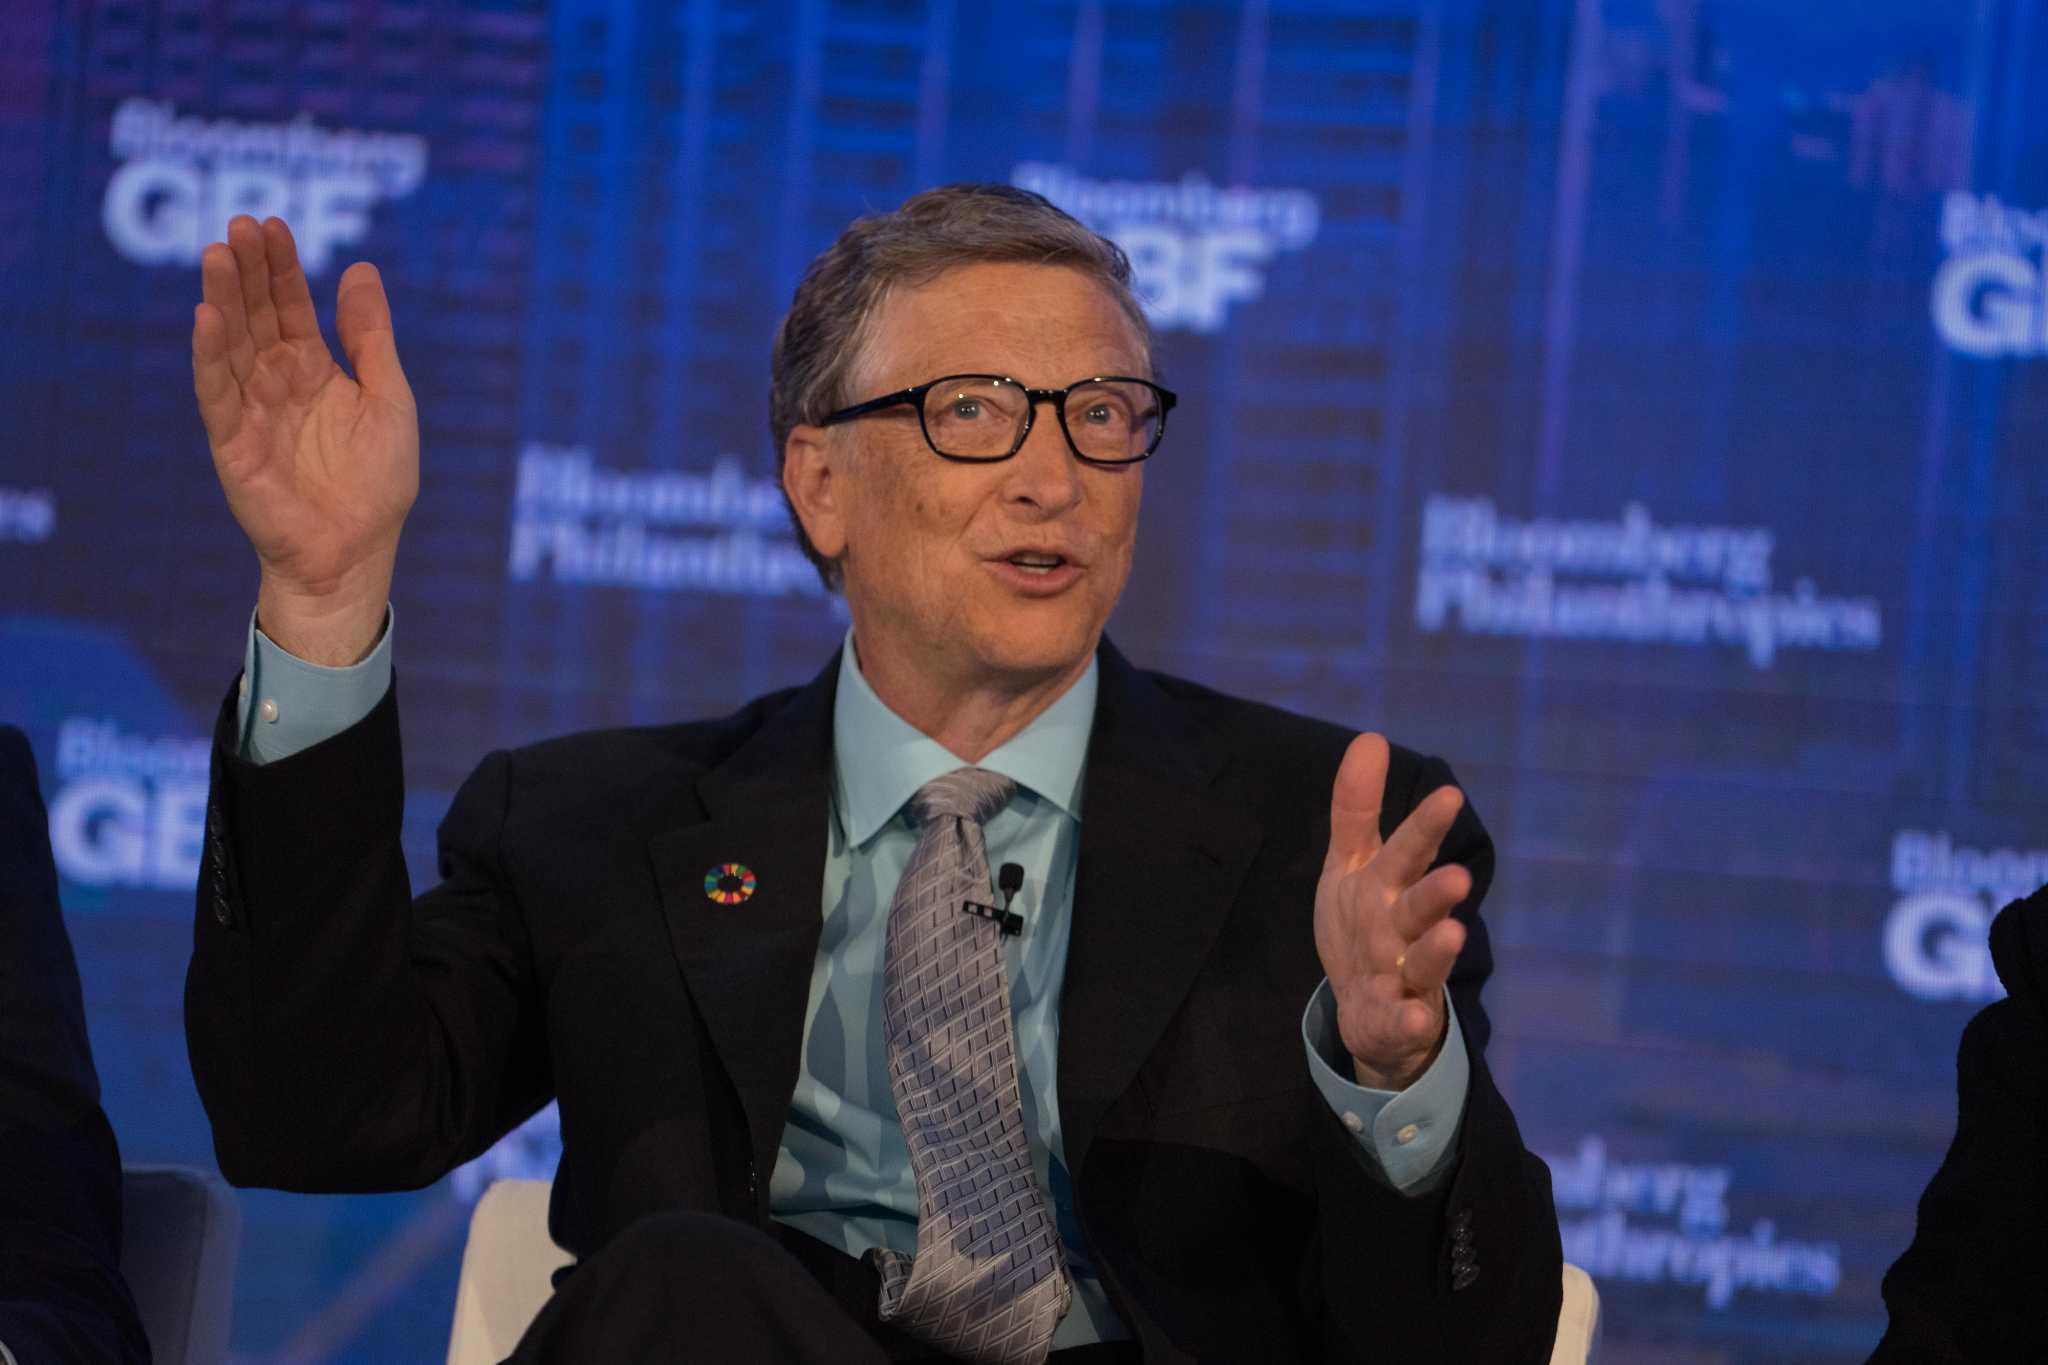 Bill Gates announces a $1.7 billion investment in US public schools